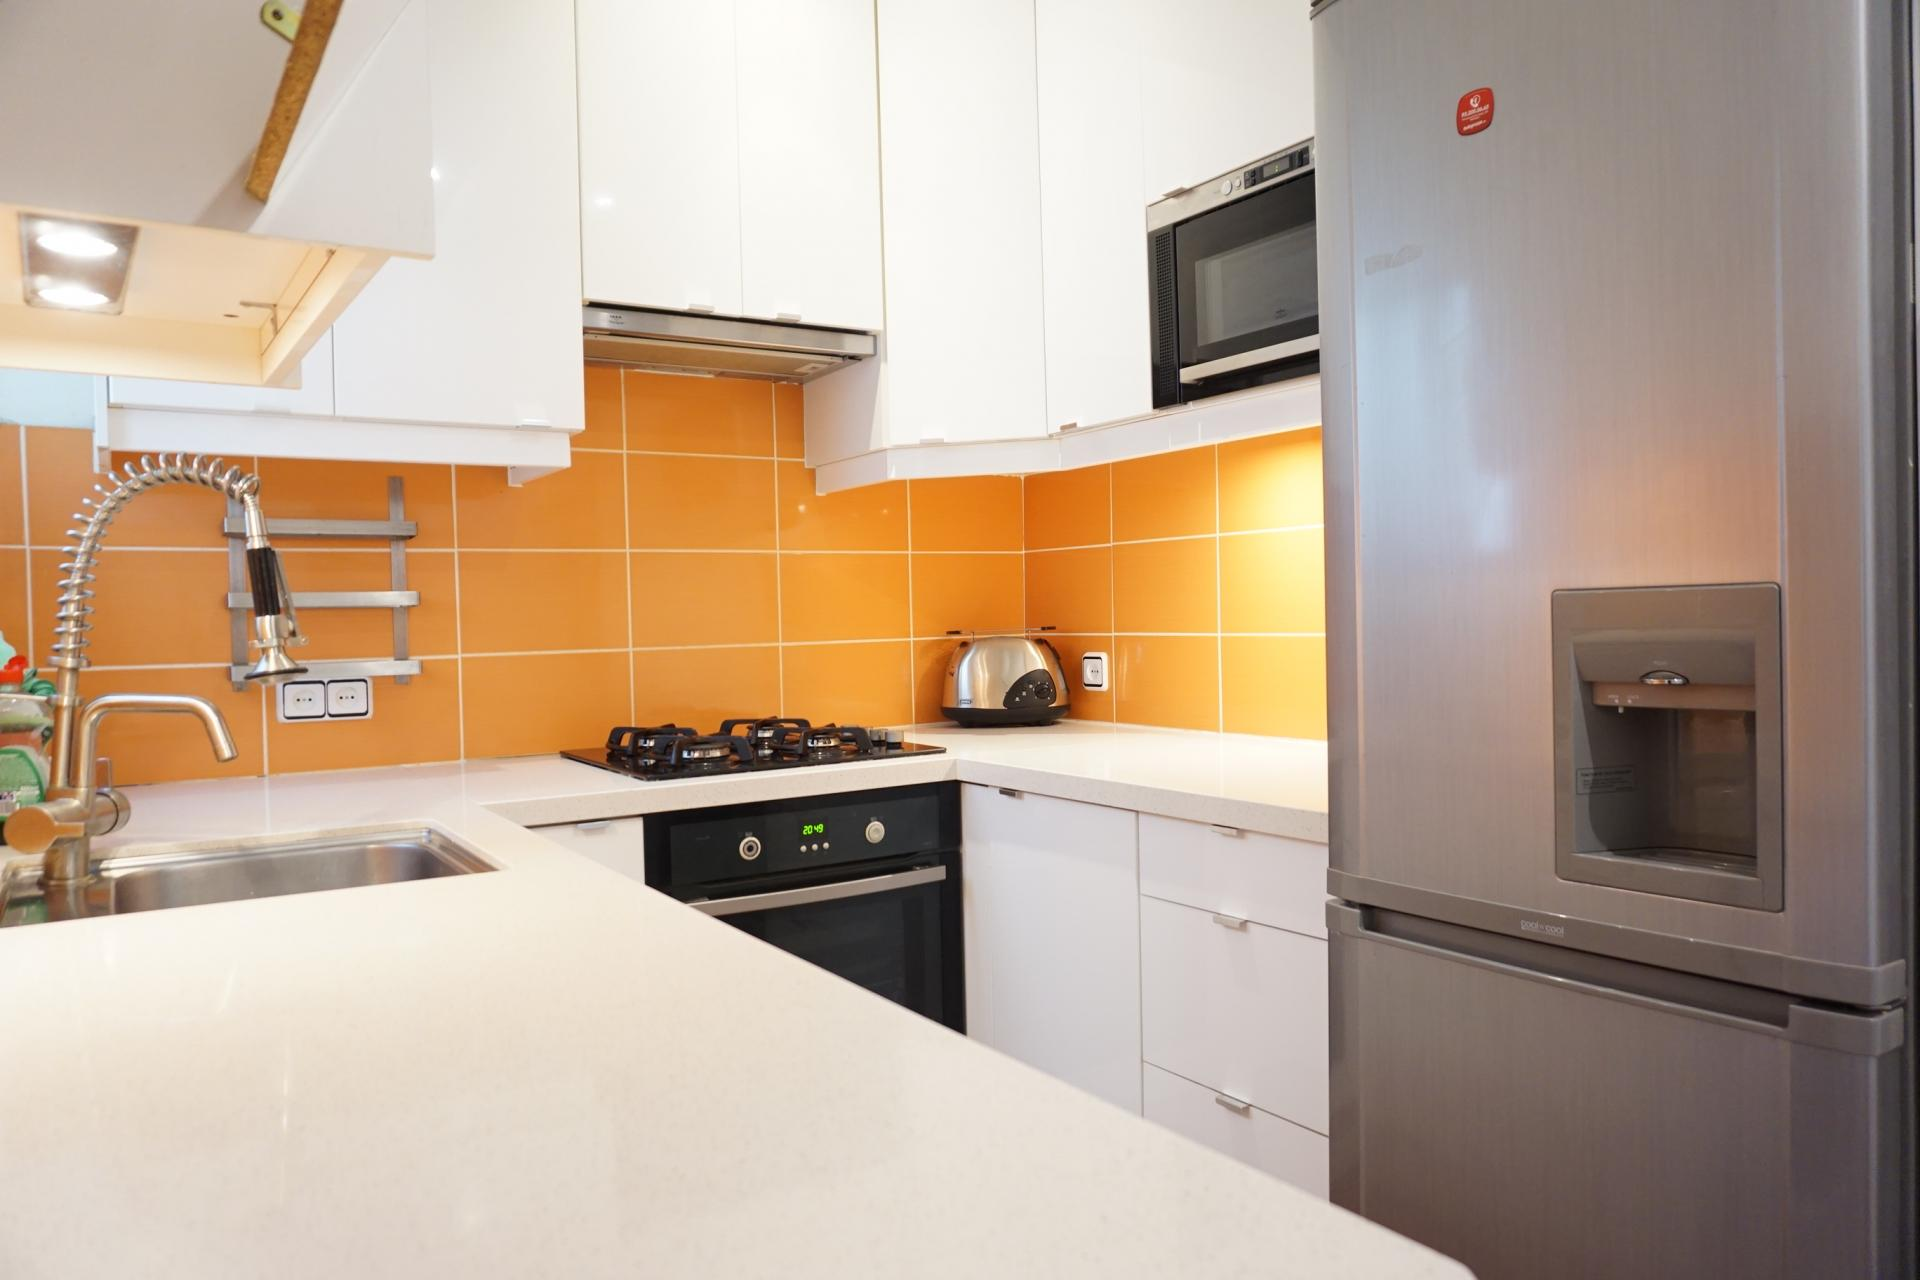 appartement louer barcelona sants montju c bejar mallorca. Black Bedroom Furniture Sets. Home Design Ideas